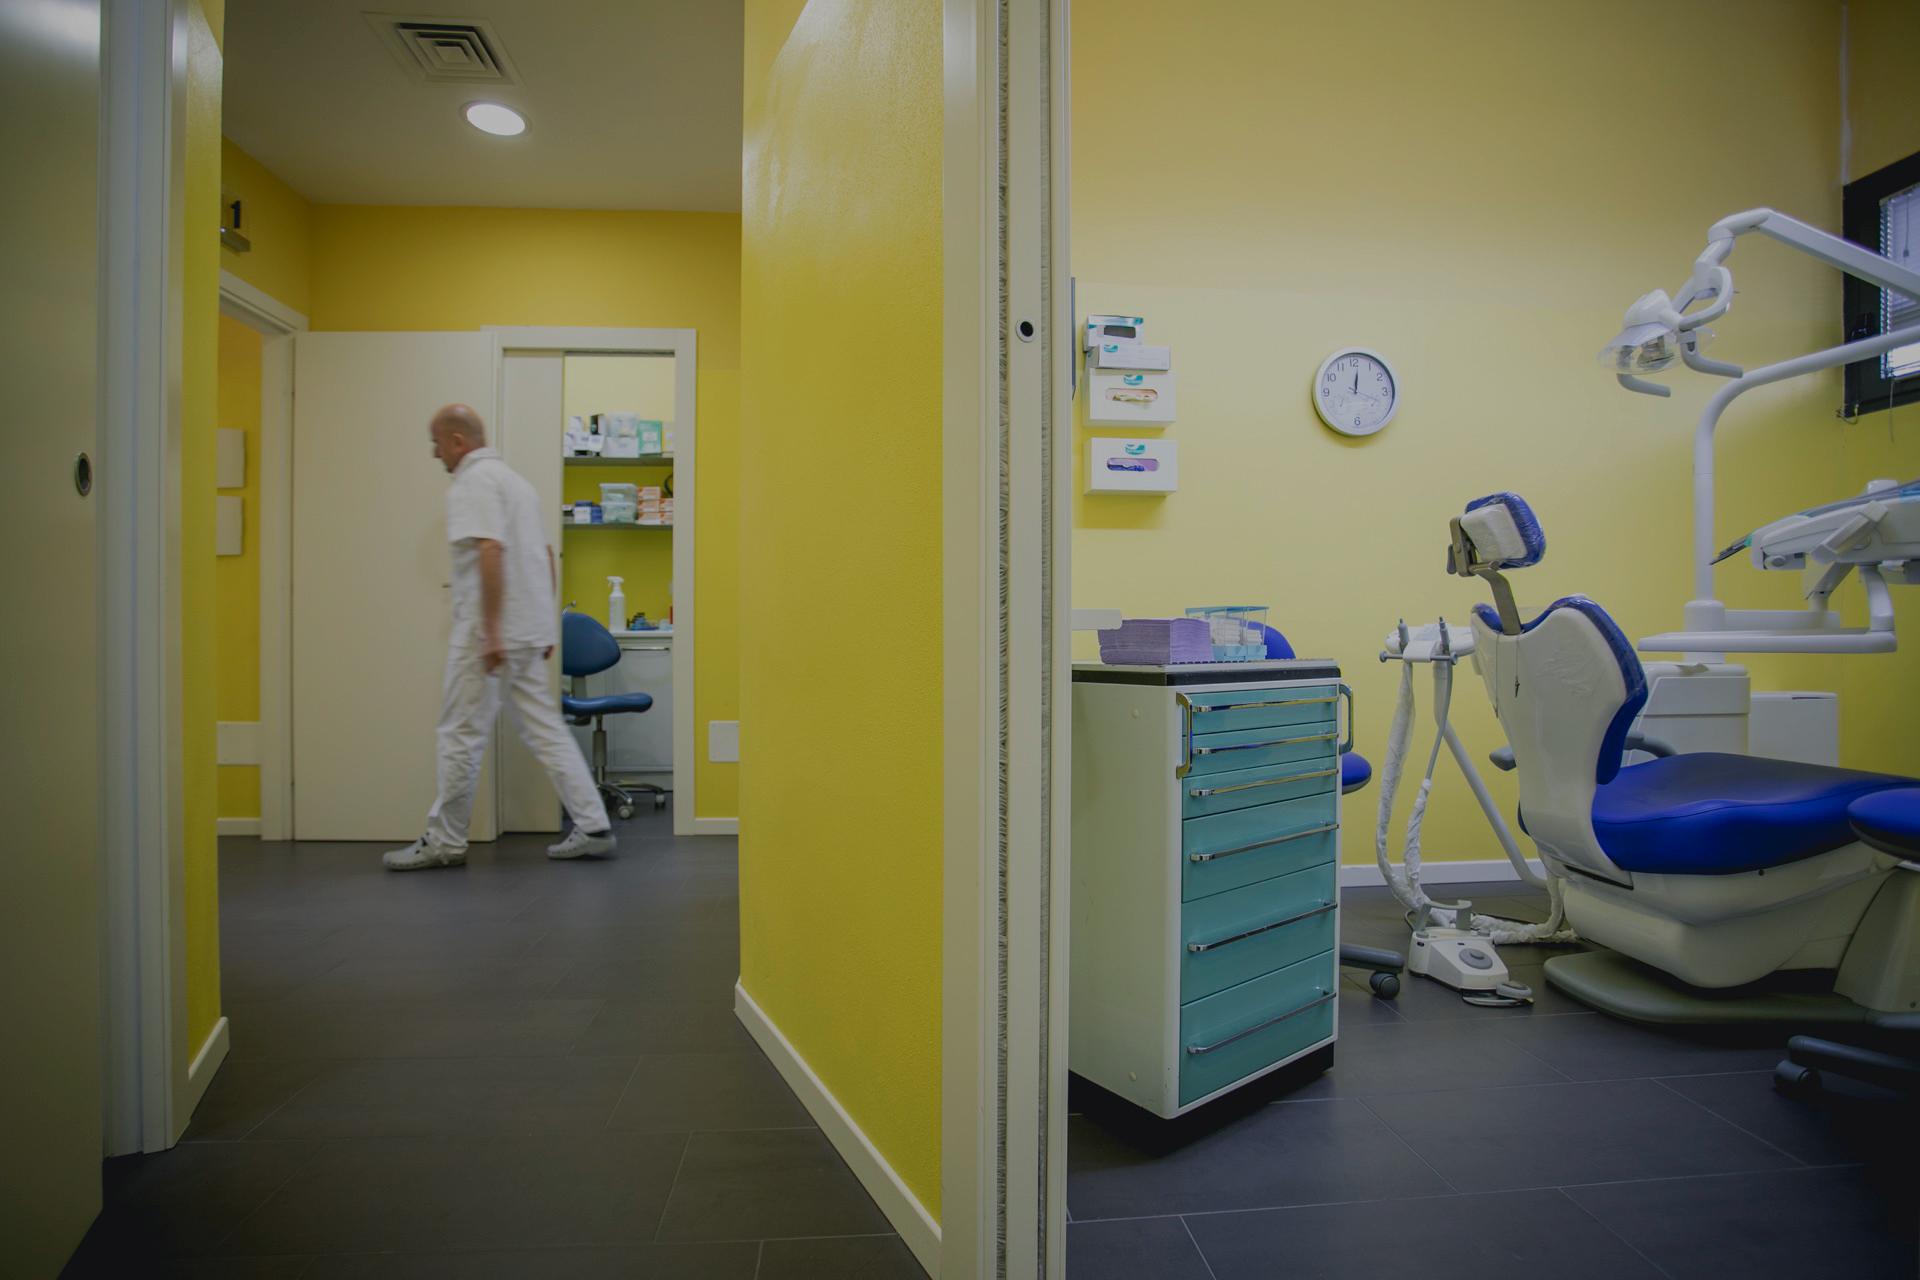 Servizi odontoiatrici offerti da Centro Odontoiatrico OS, Forlì